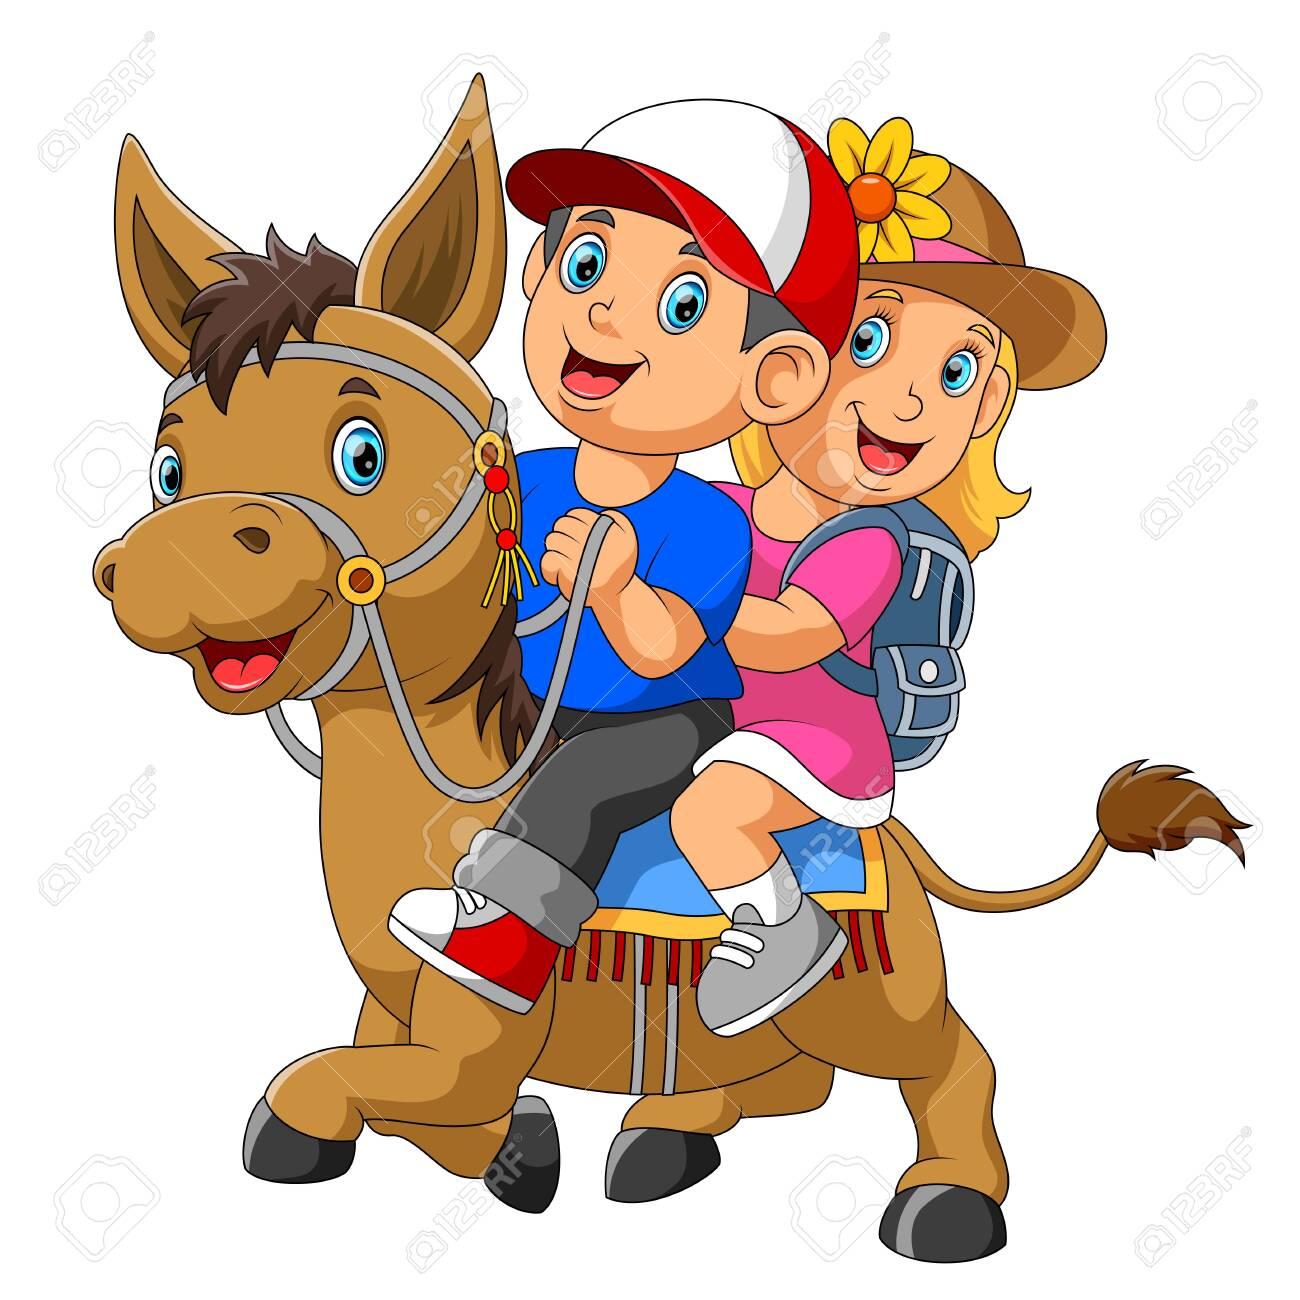 A boy and girl riding horse - 128160113